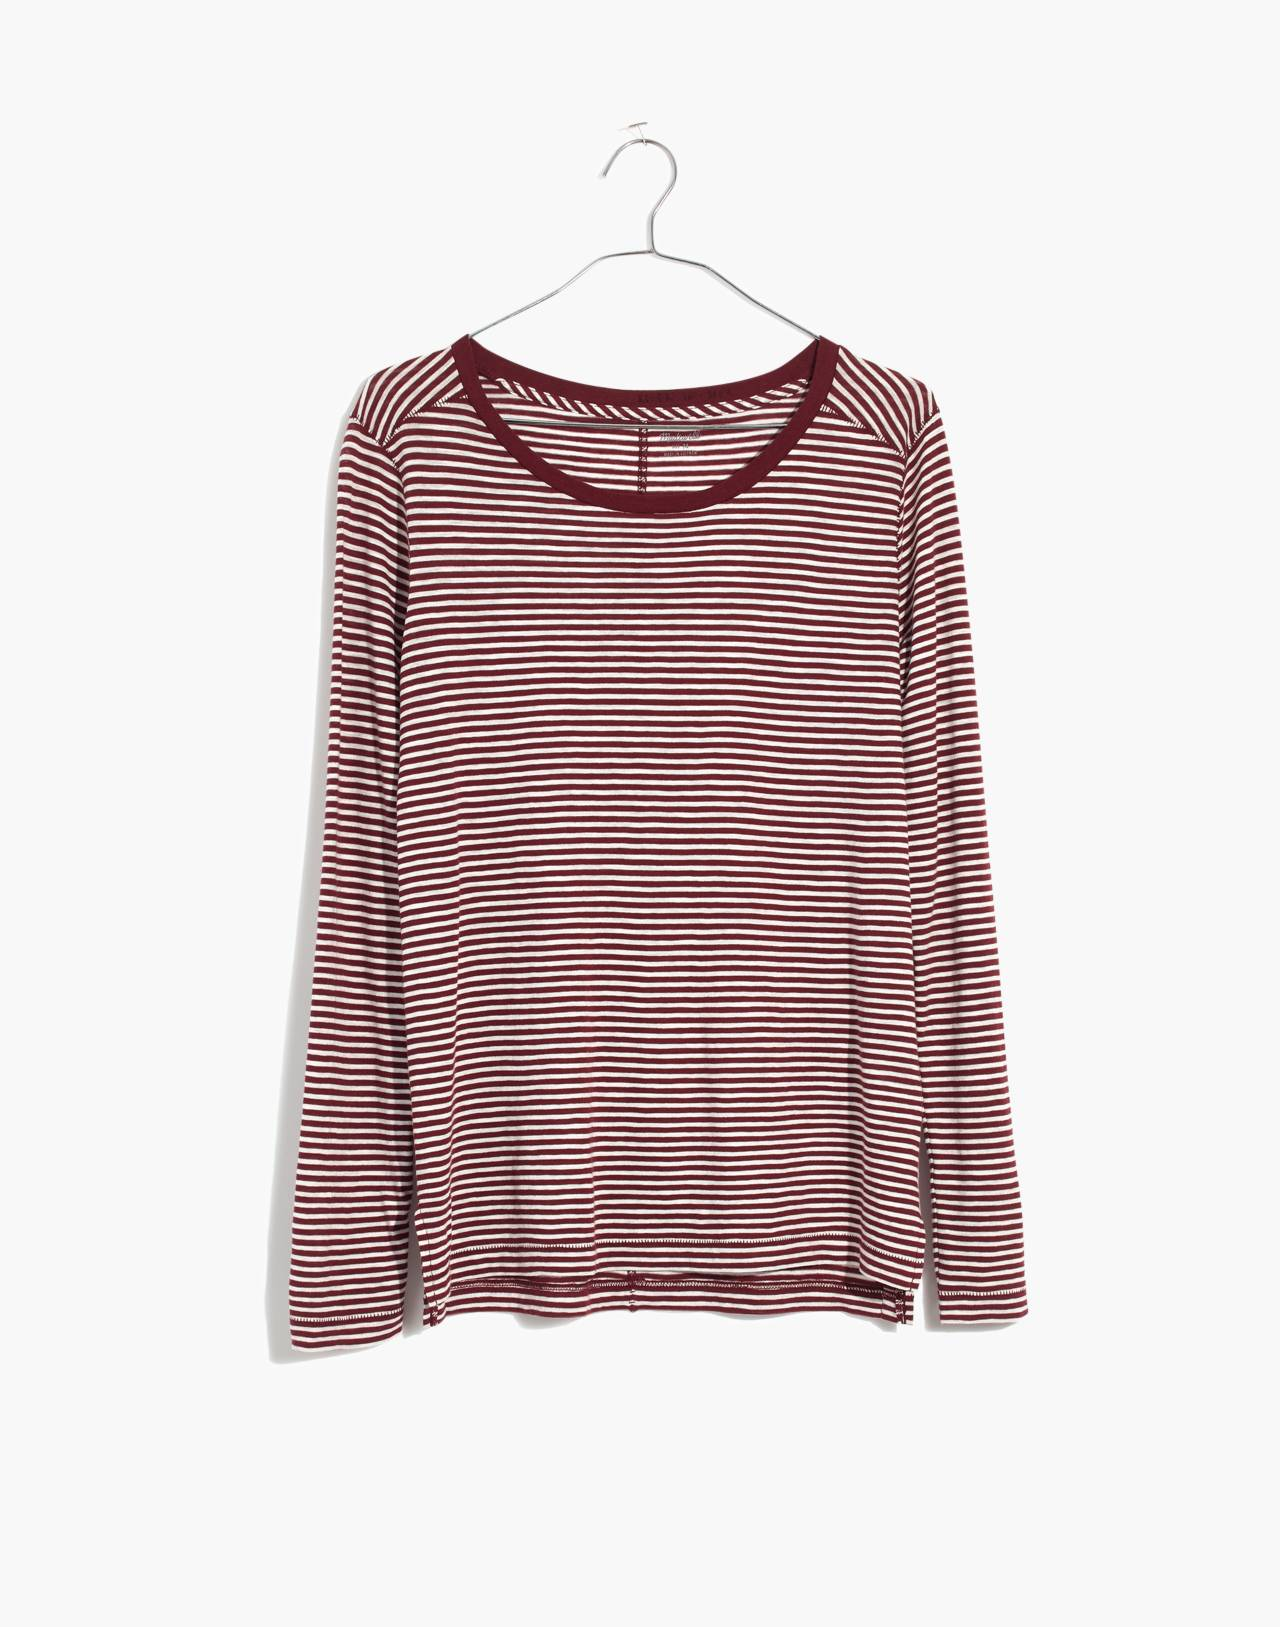 Whisper Cotton Long-Sleeve Crewneck Tee in Daniela Stripe in cabernet image 4